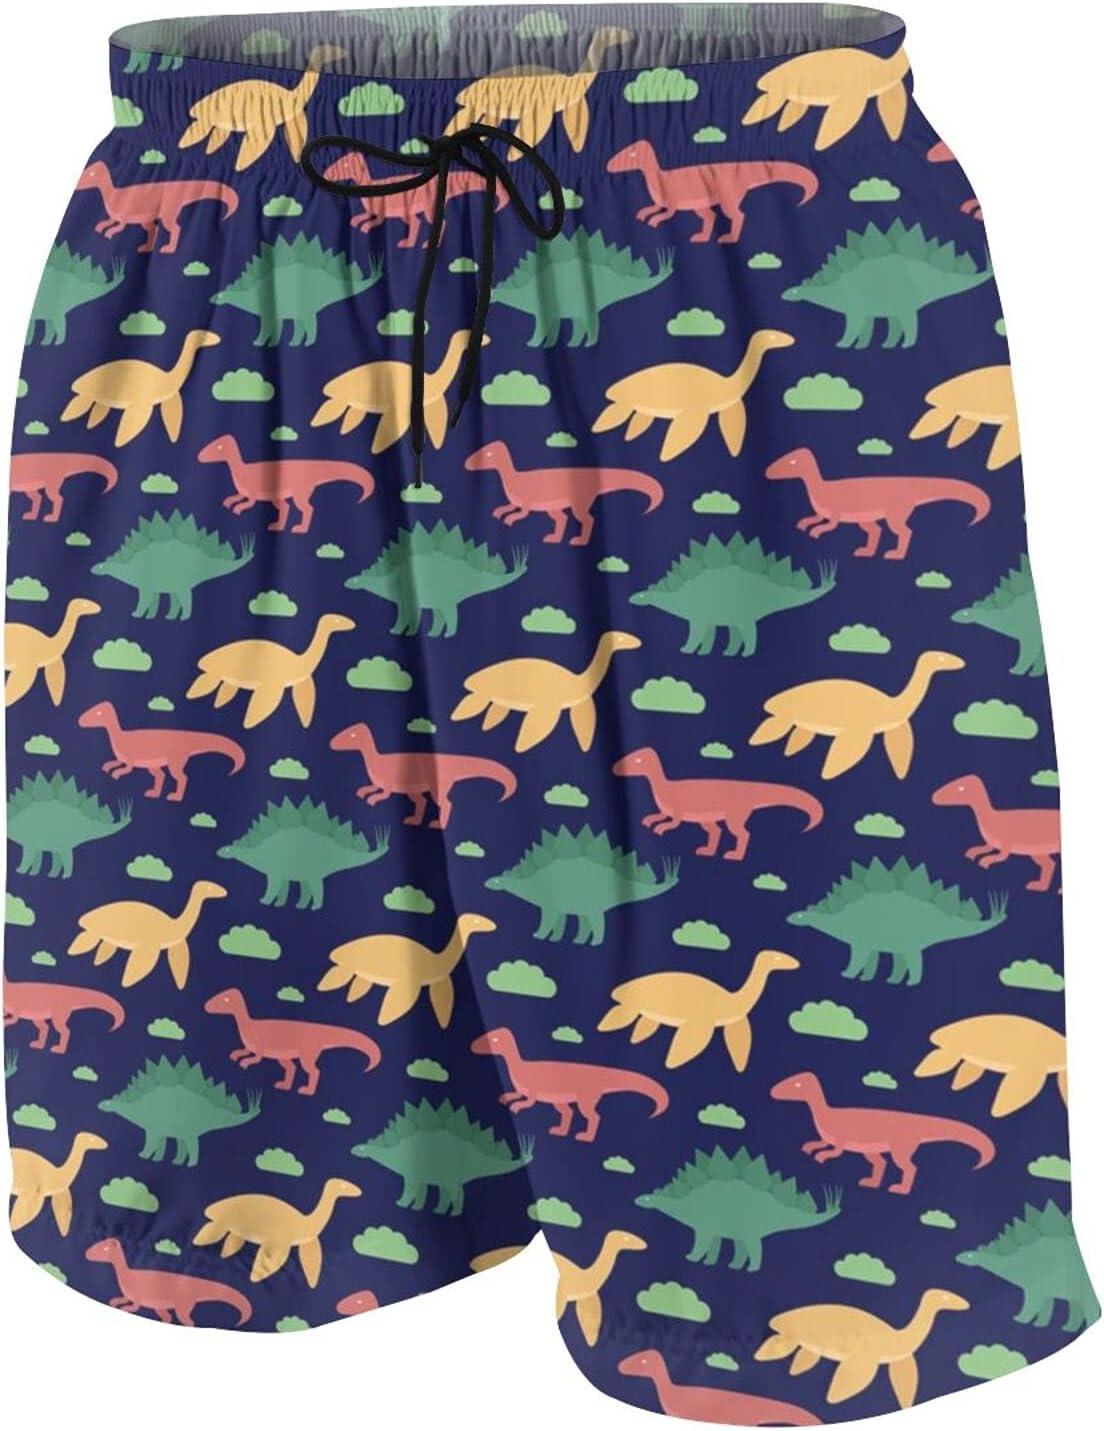 KAETZRU Boys Swim Trunks Beach Board Shorts Dinosaur Cartoon Dino Pattern Kids Summer Swimsuit